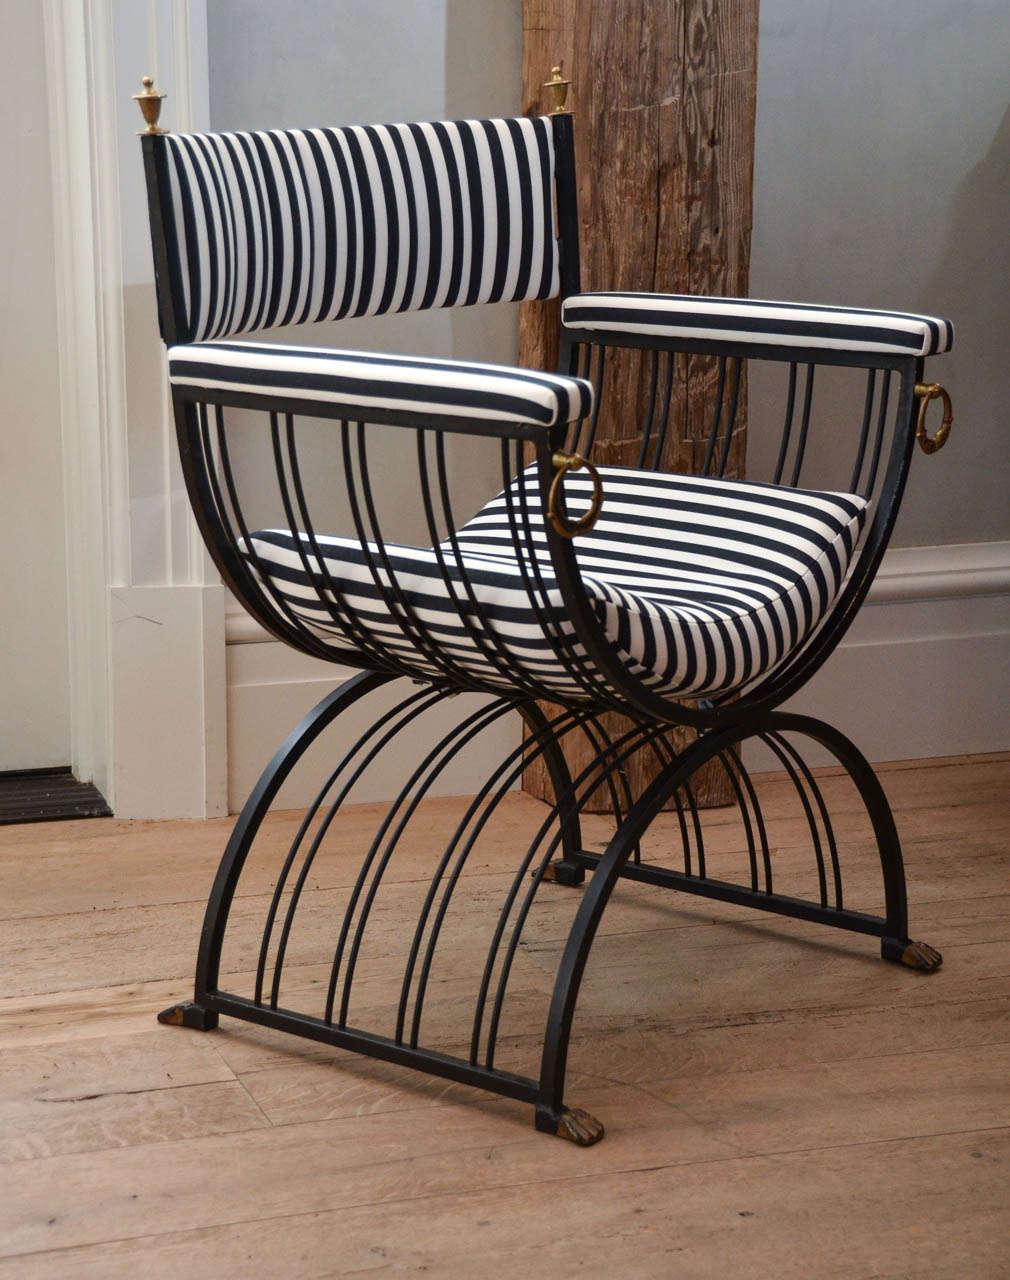 Modern savonarola chair - Pair of roman inspired savonarola chair in iron with brass ornamentation 3